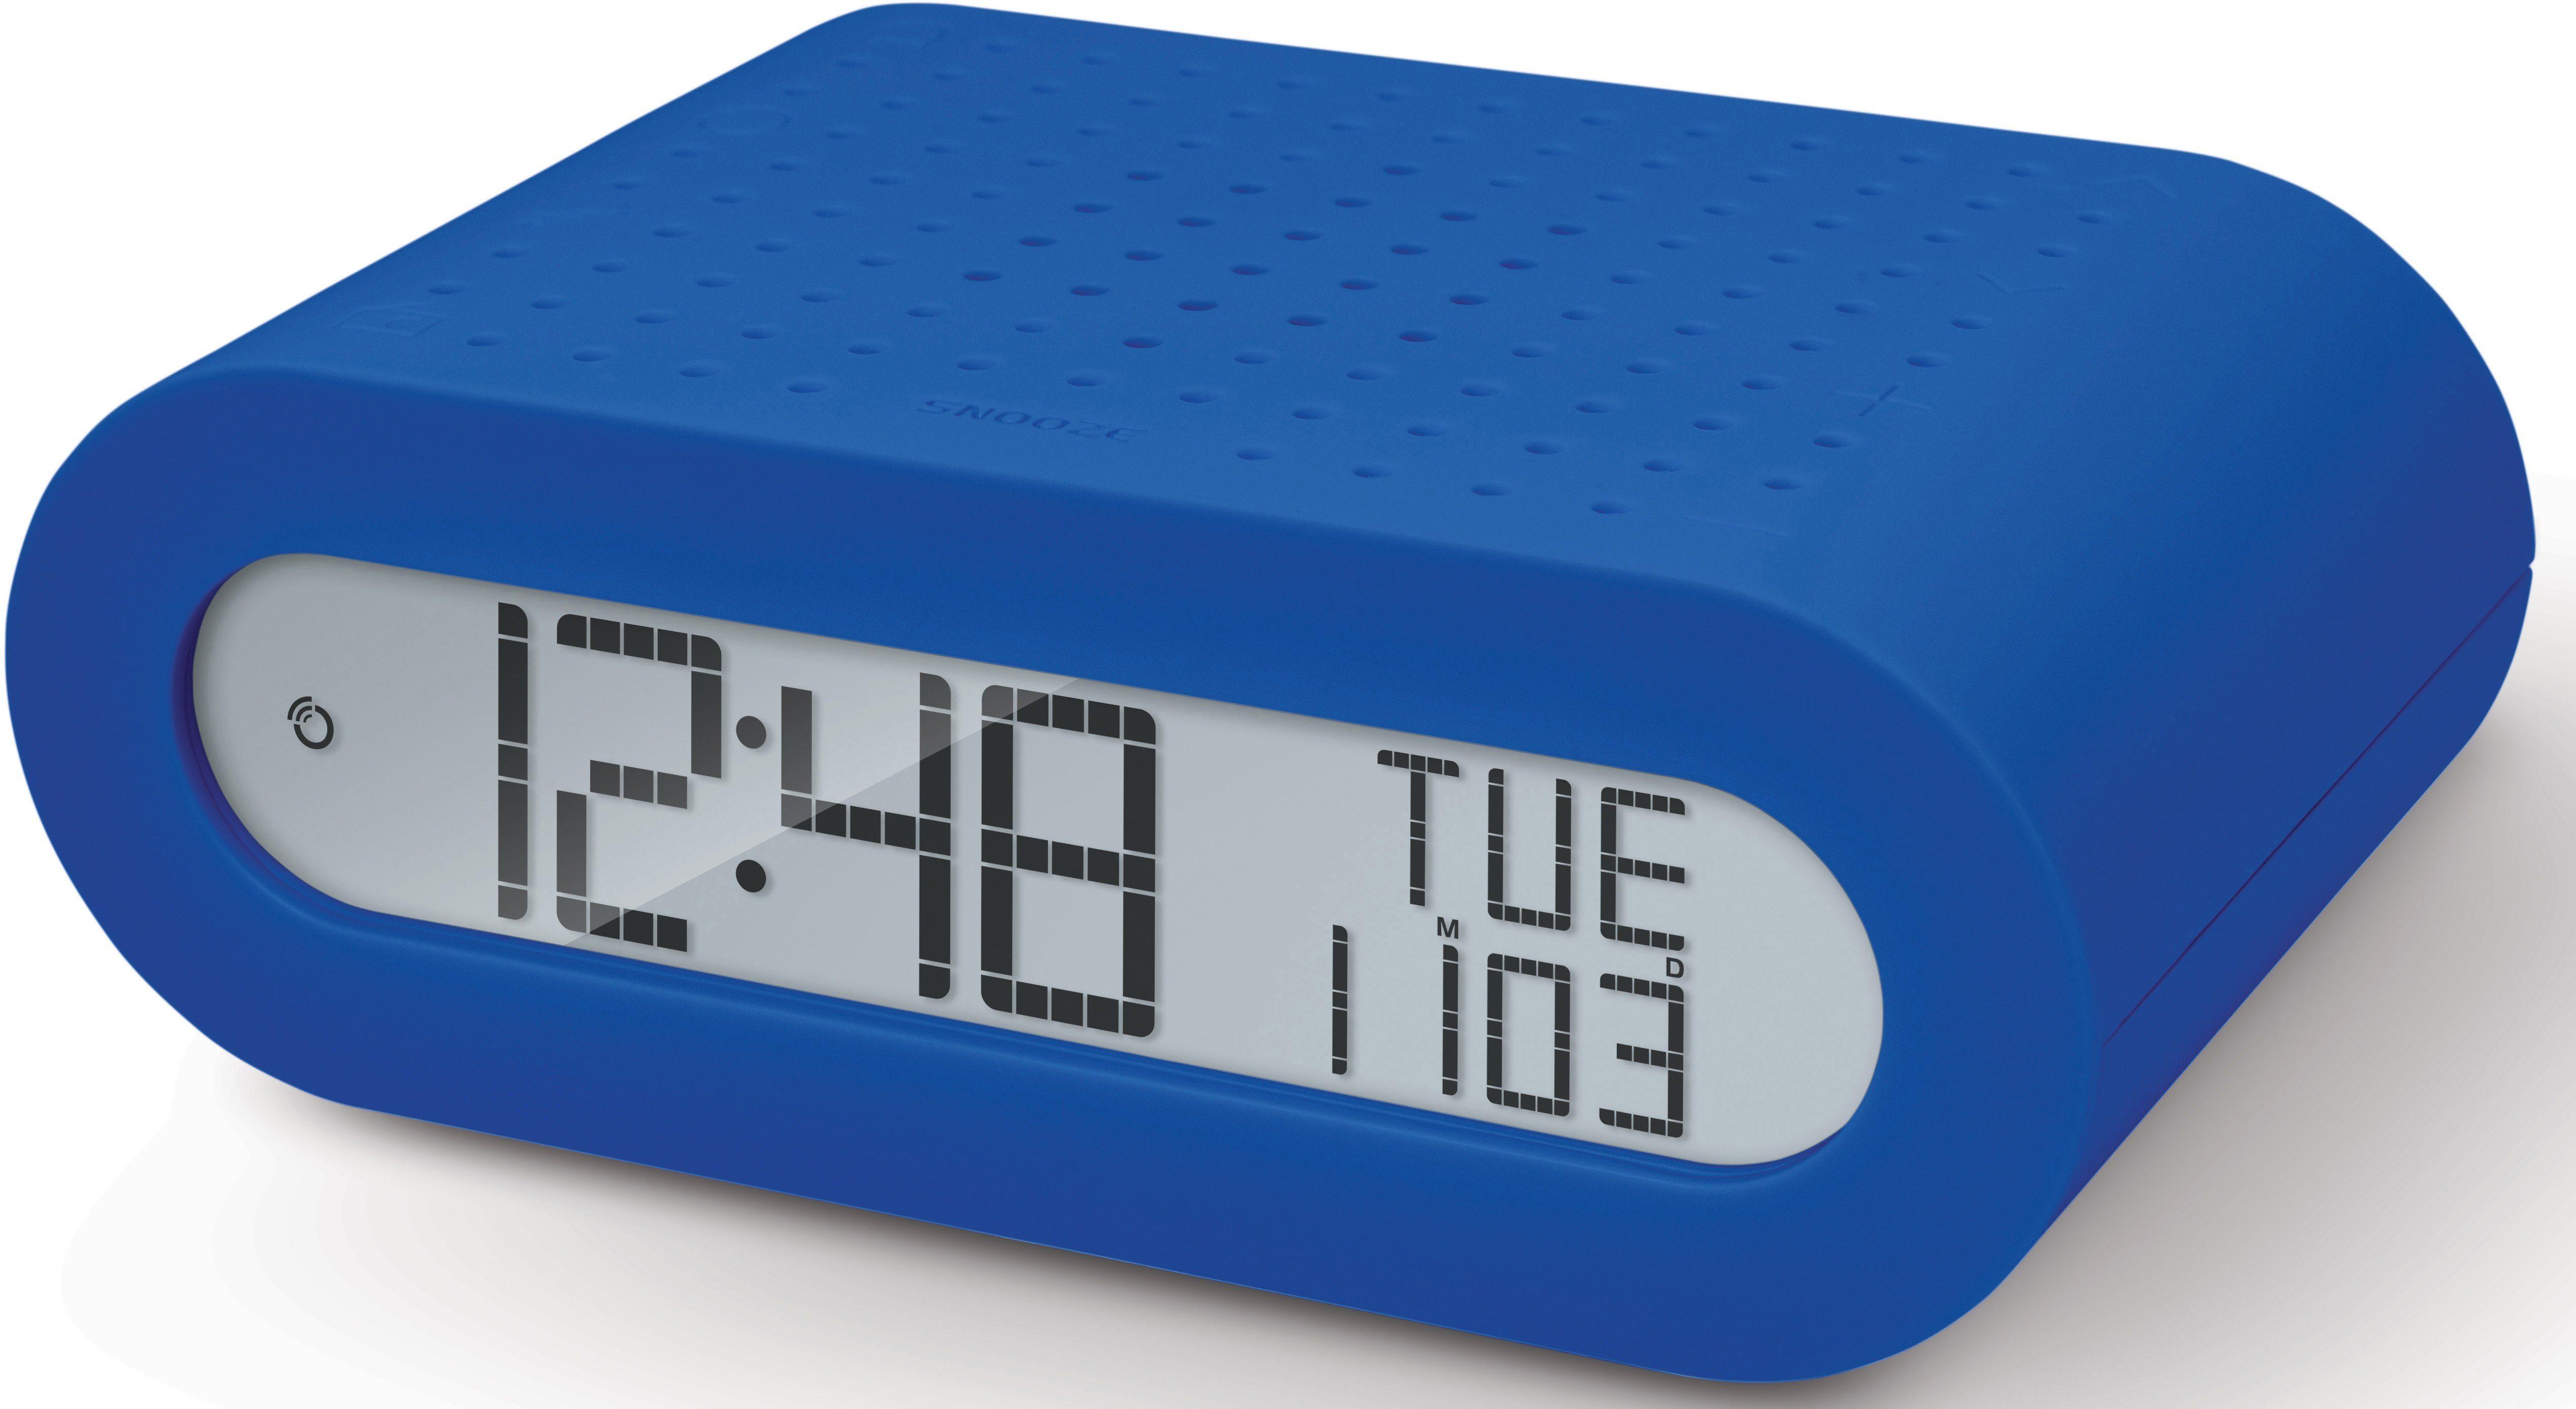 Oregon Scientific Funkradiowecker, »RRM 116 blue, 2377«